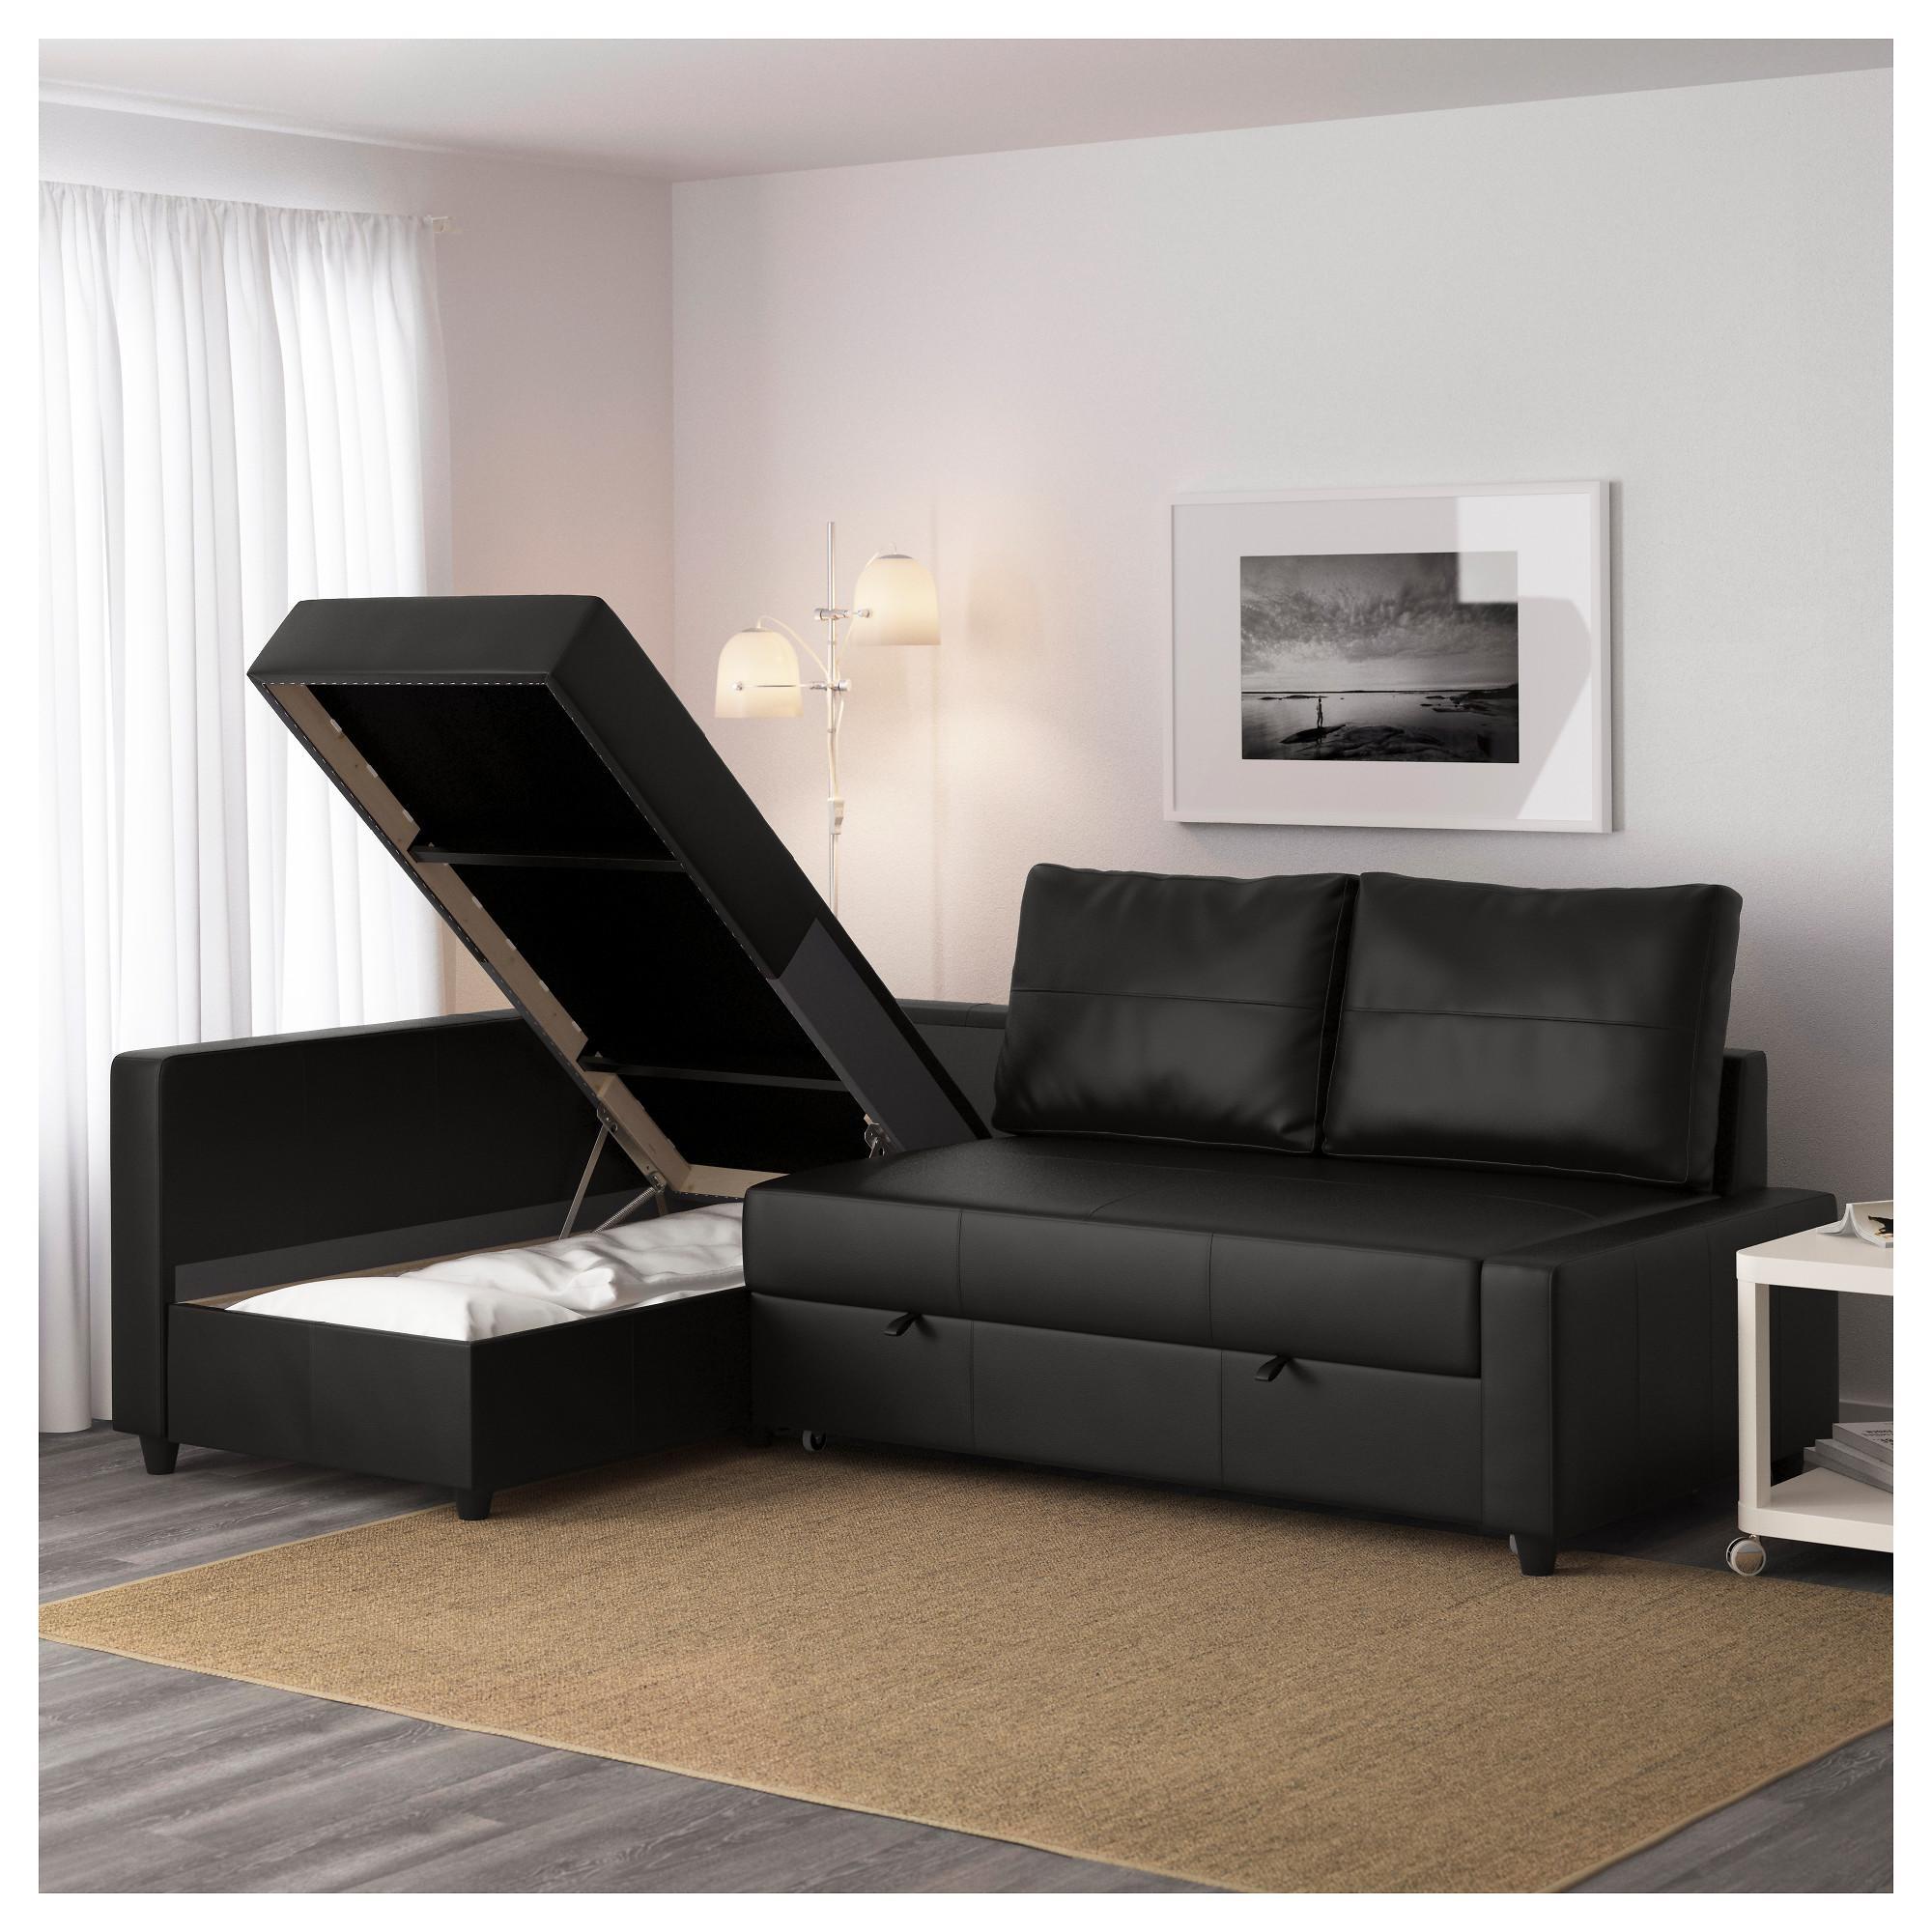 Friheten Corner Sofa Bed With Storage – Skiftebo Dark Gray – Ikea With Ikea Corner Sofa Bed With Storage (View 9 of 20)